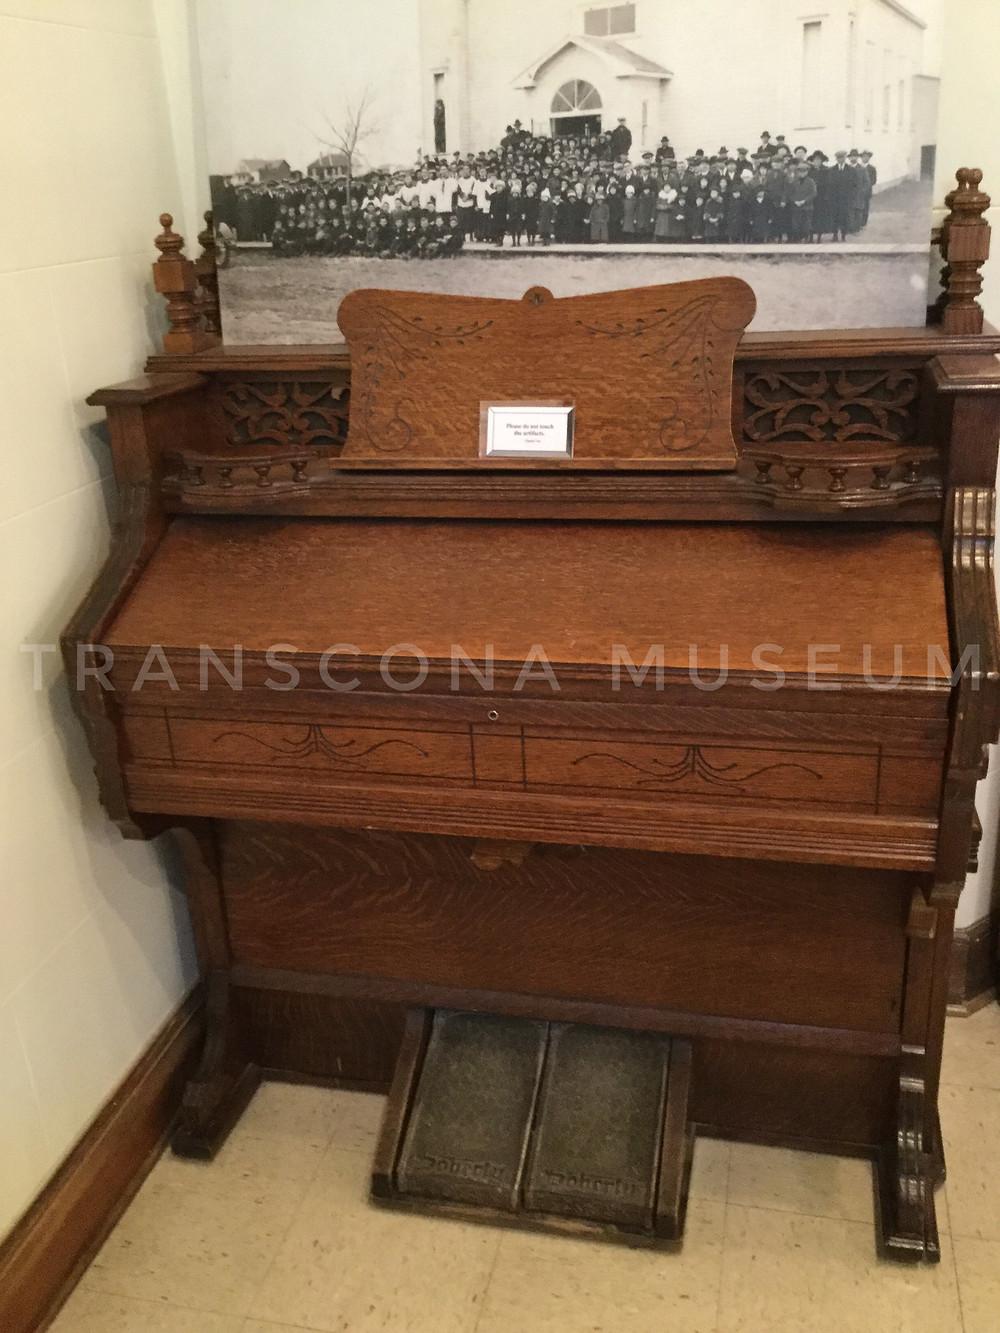 Organ at Transcona Museum